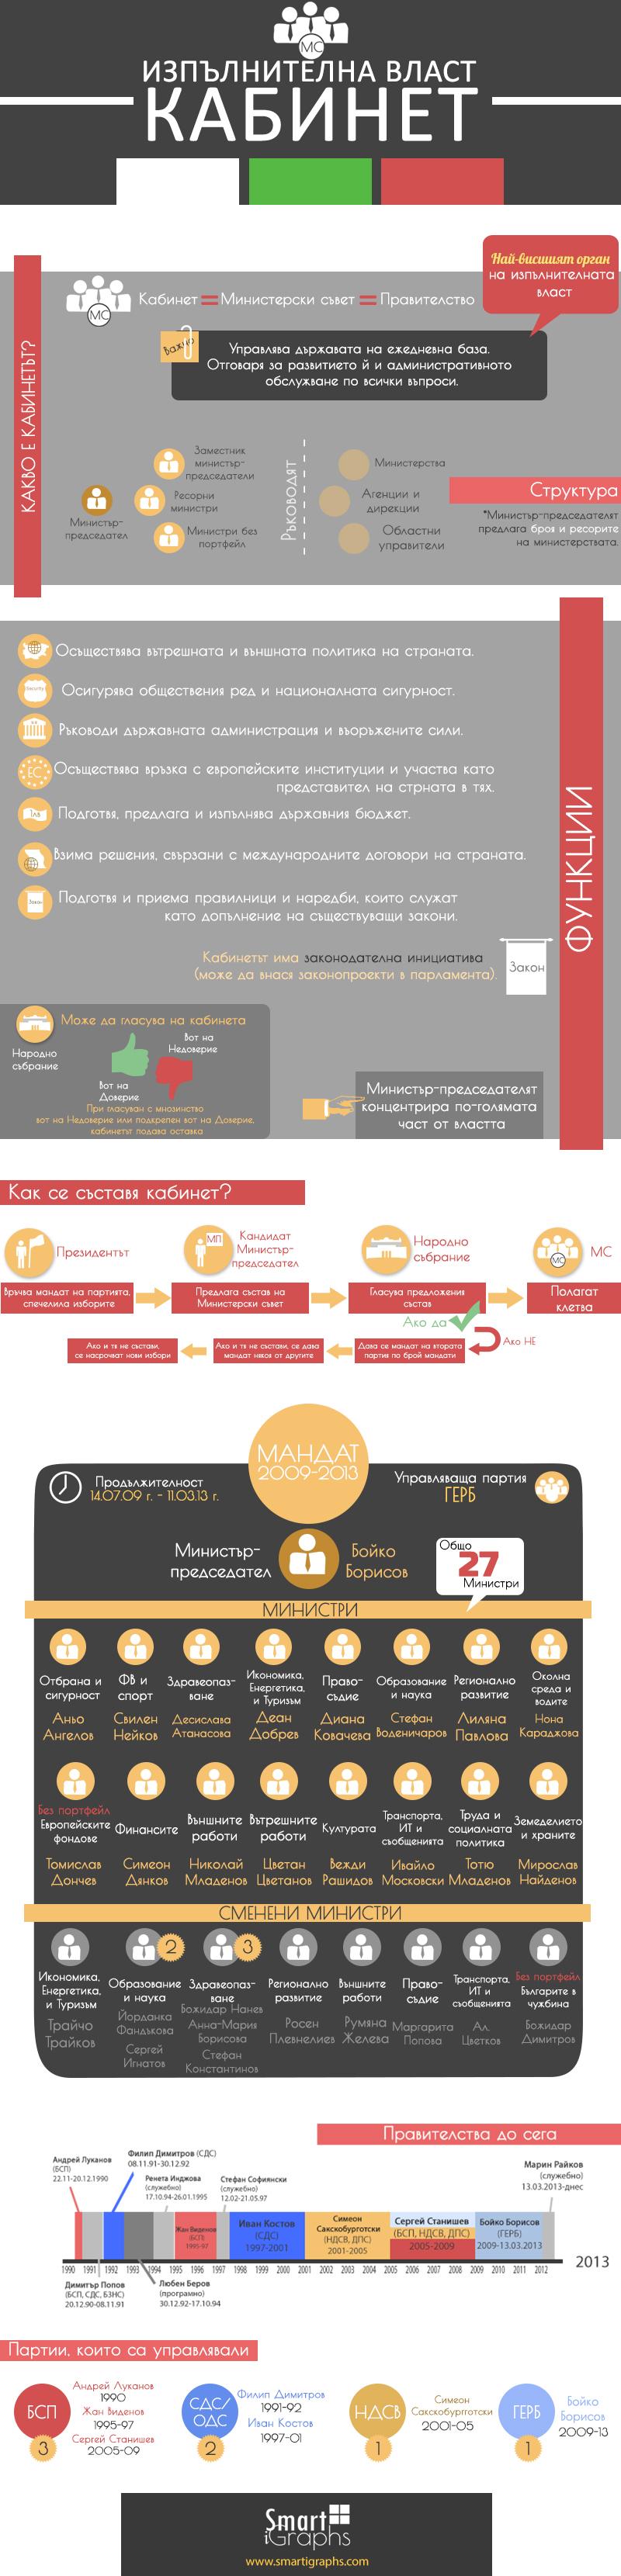 infographic_cabienet2